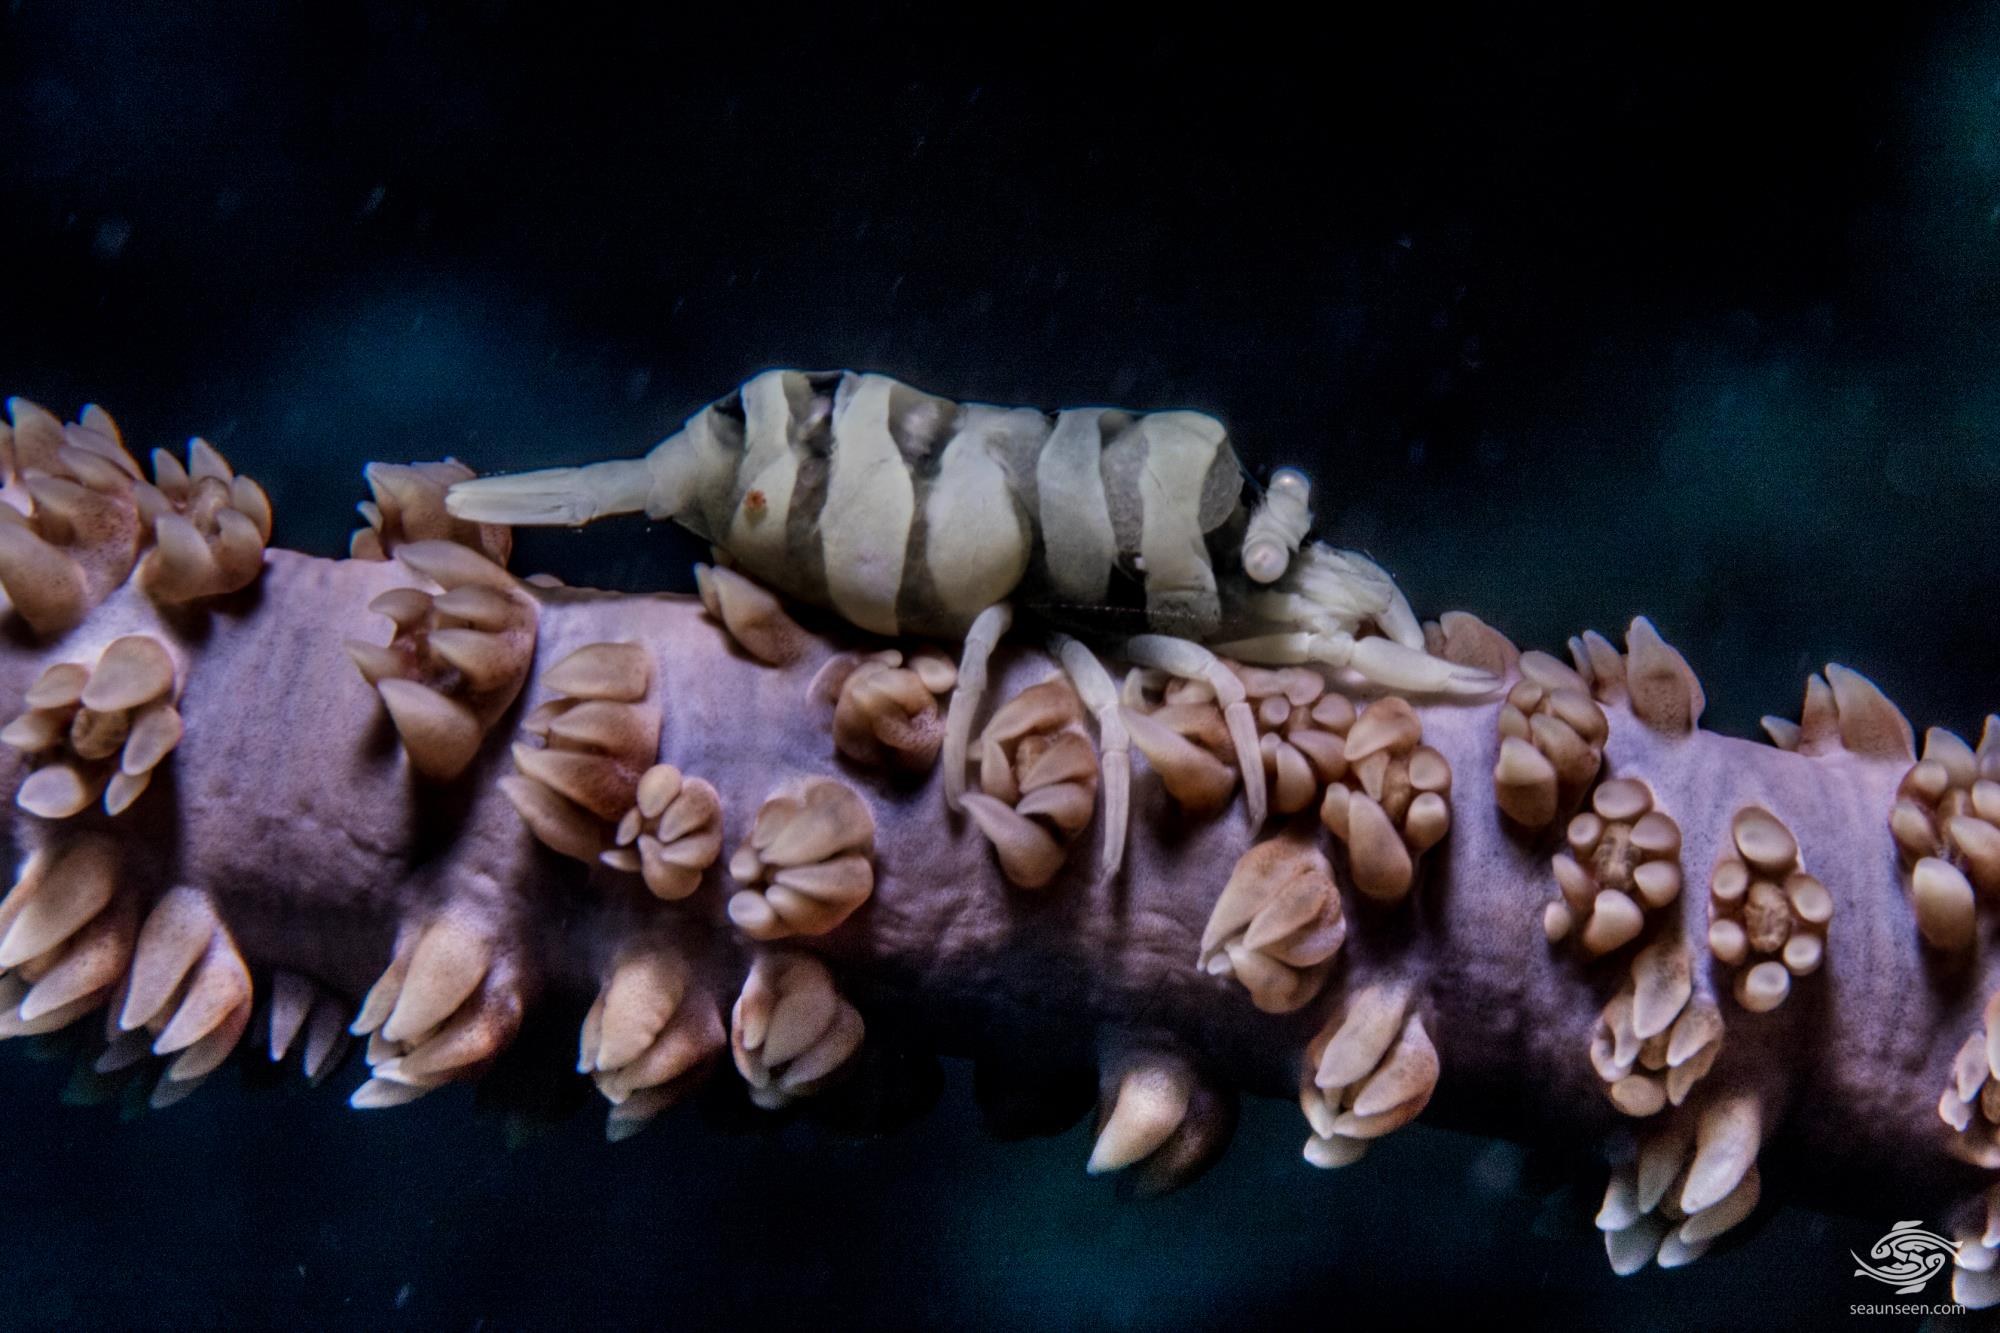 Anker's Whip Coral Shrimp (Pontonides ankeri)